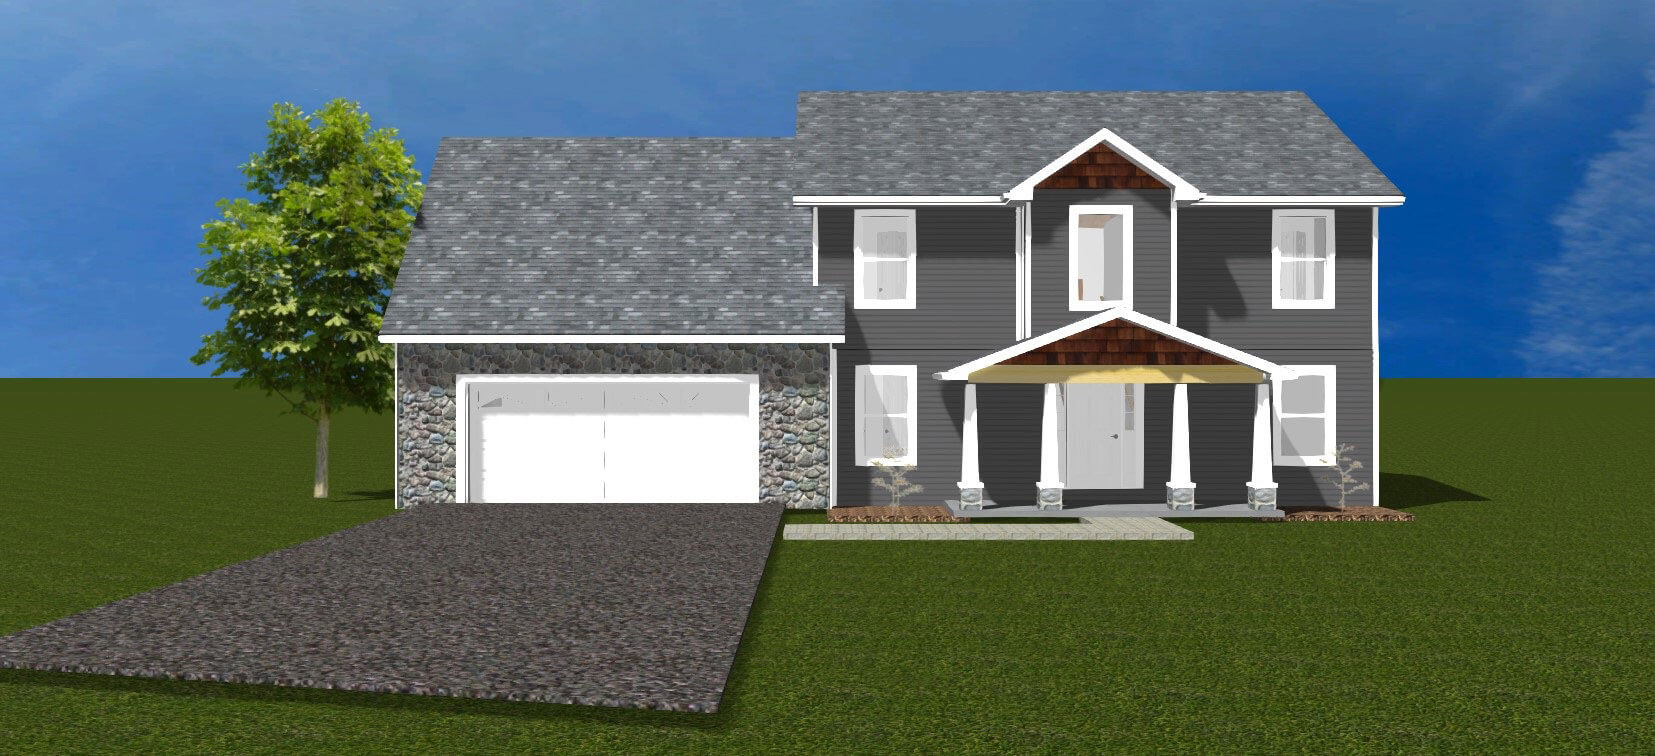 Home floor plans in Bloomington - Kingstone Front